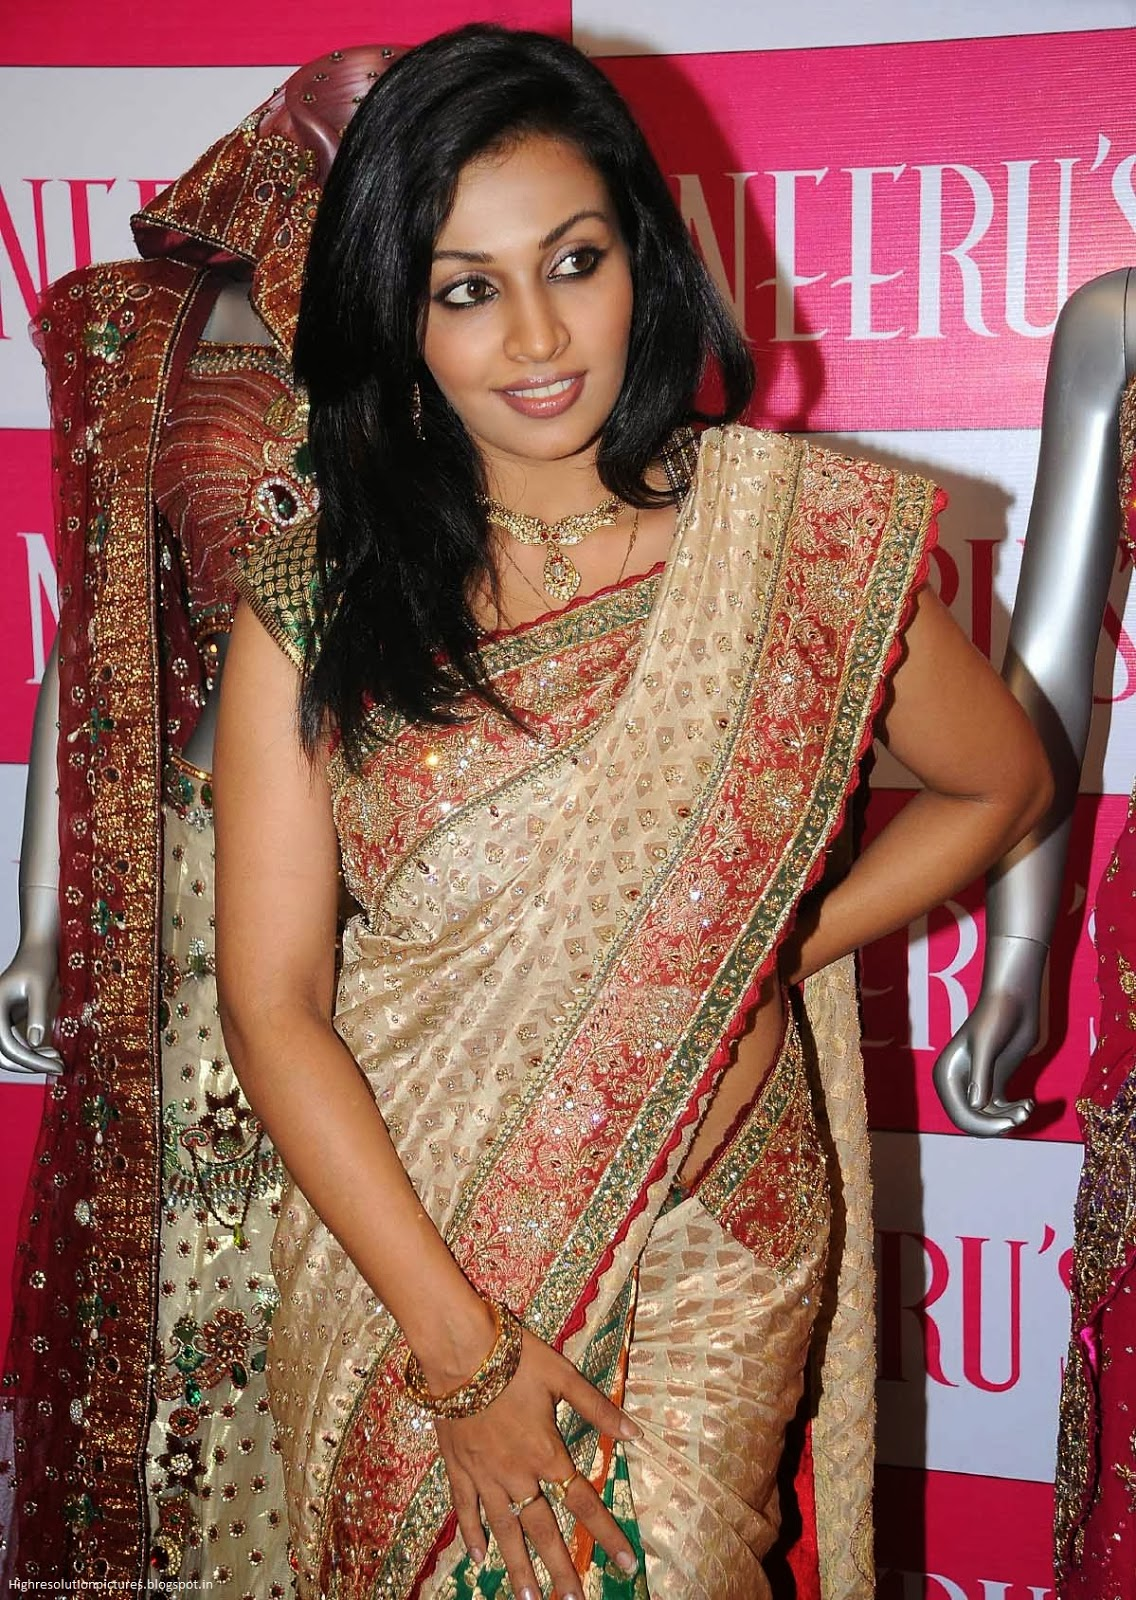 Asha Saini Hot Stills ~ High Resolution Pictures